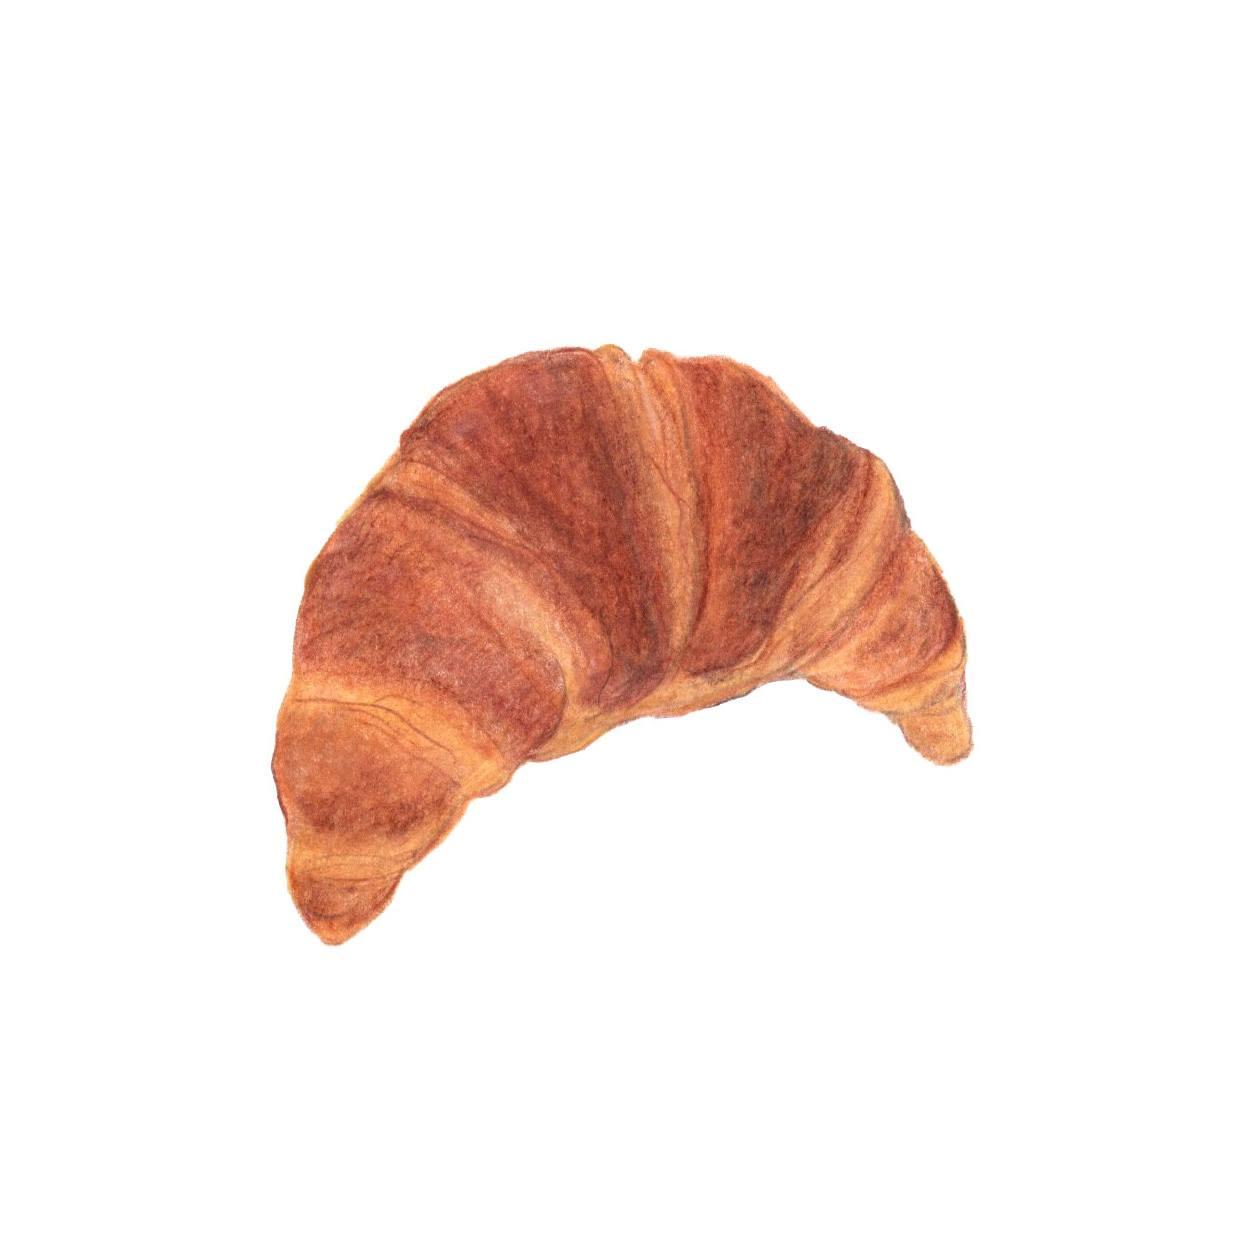 Croissant Pauline Chew